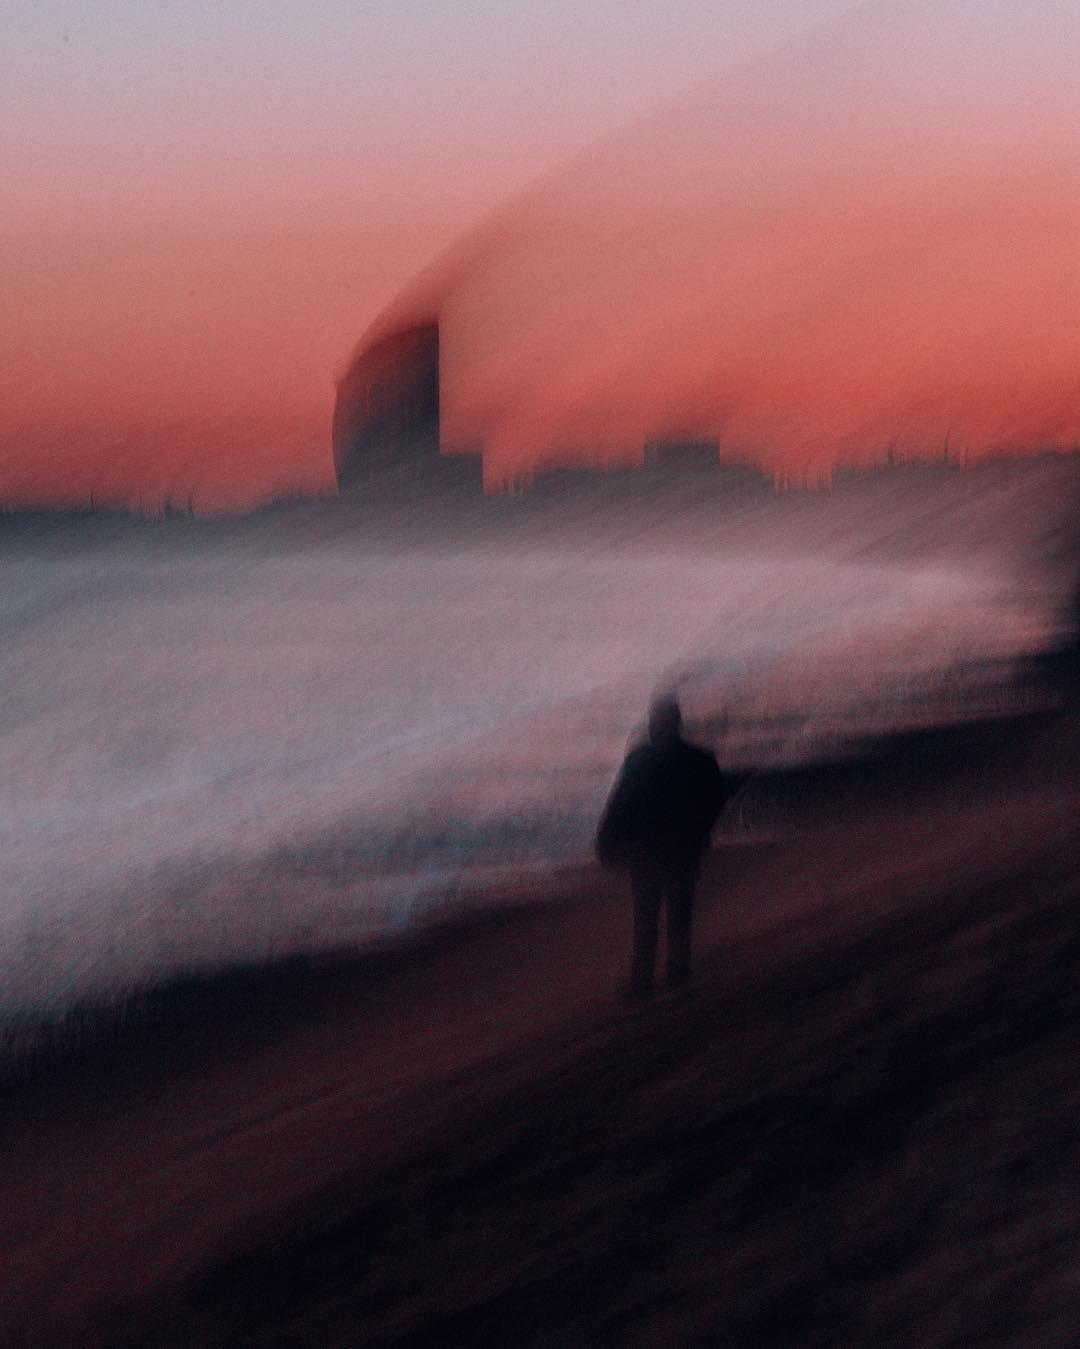 © alexandrucostin / Instagram